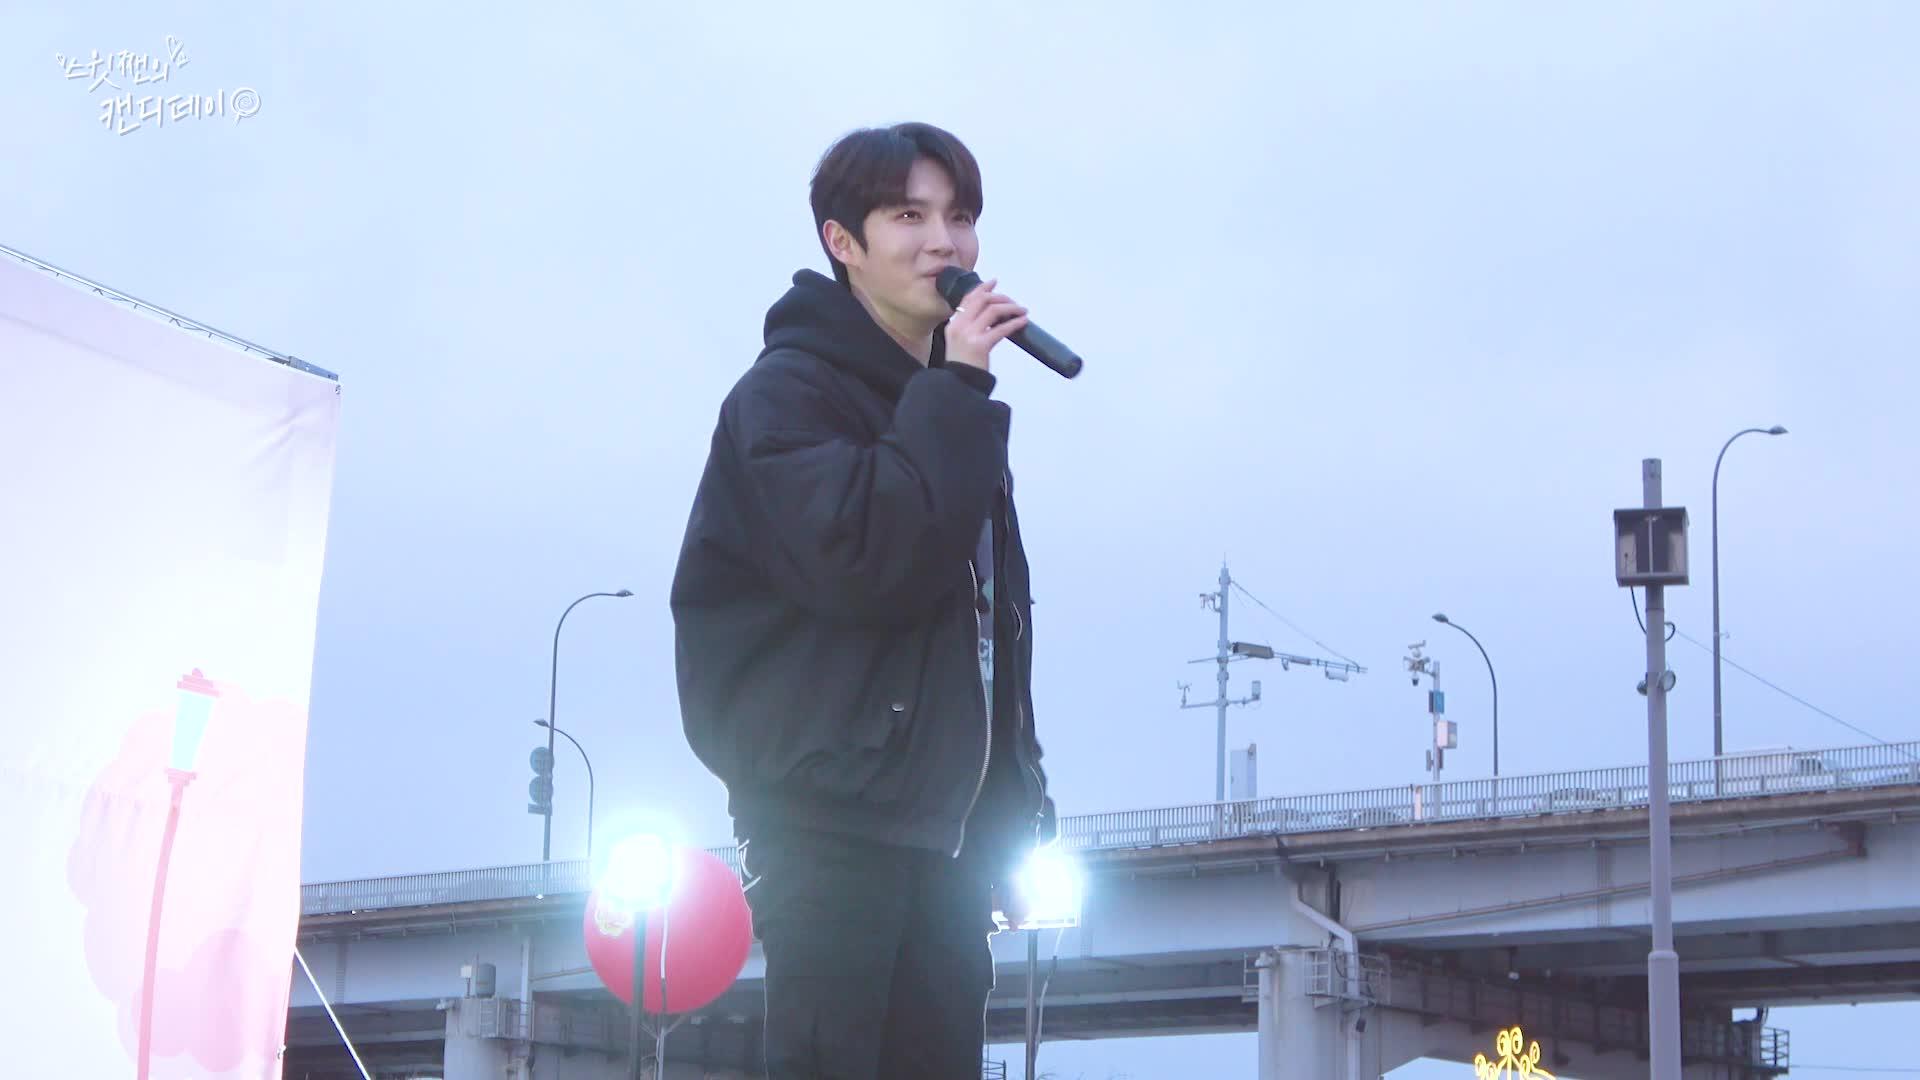 [BEHIND] 김재환(Kim jaehwan) - 스윗한짼의 캔디데이 비하인드 (Candy Day Behind)